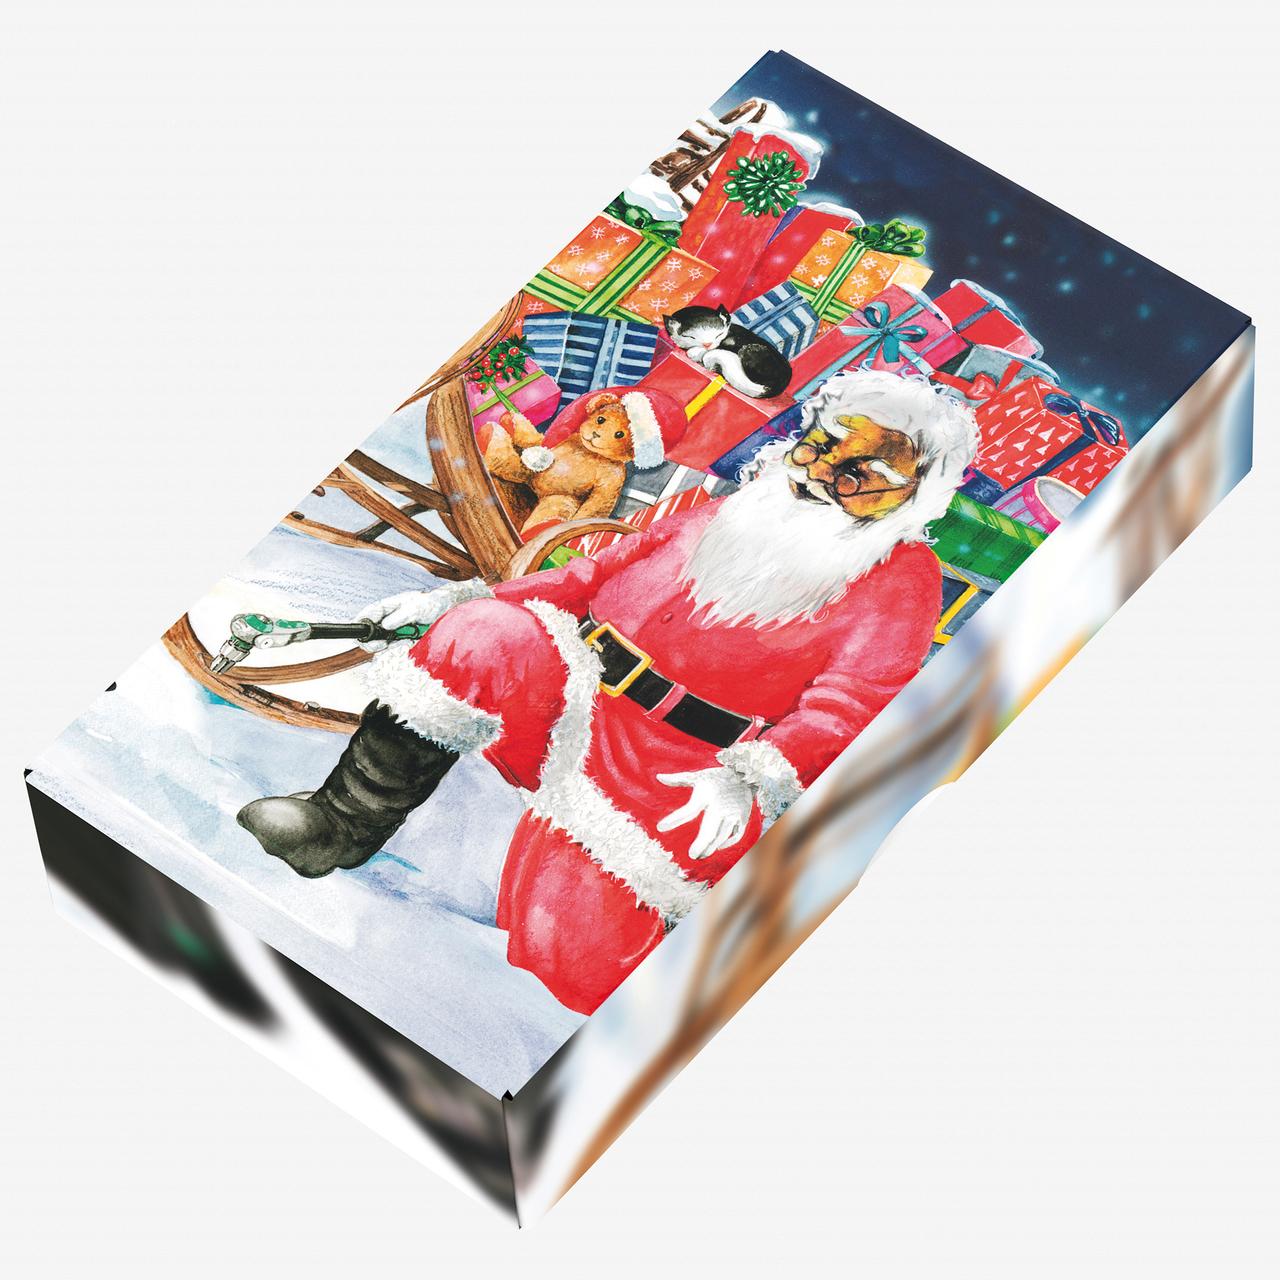 Wera 135977 Kraftform Kompakt Christmas - KC Tool